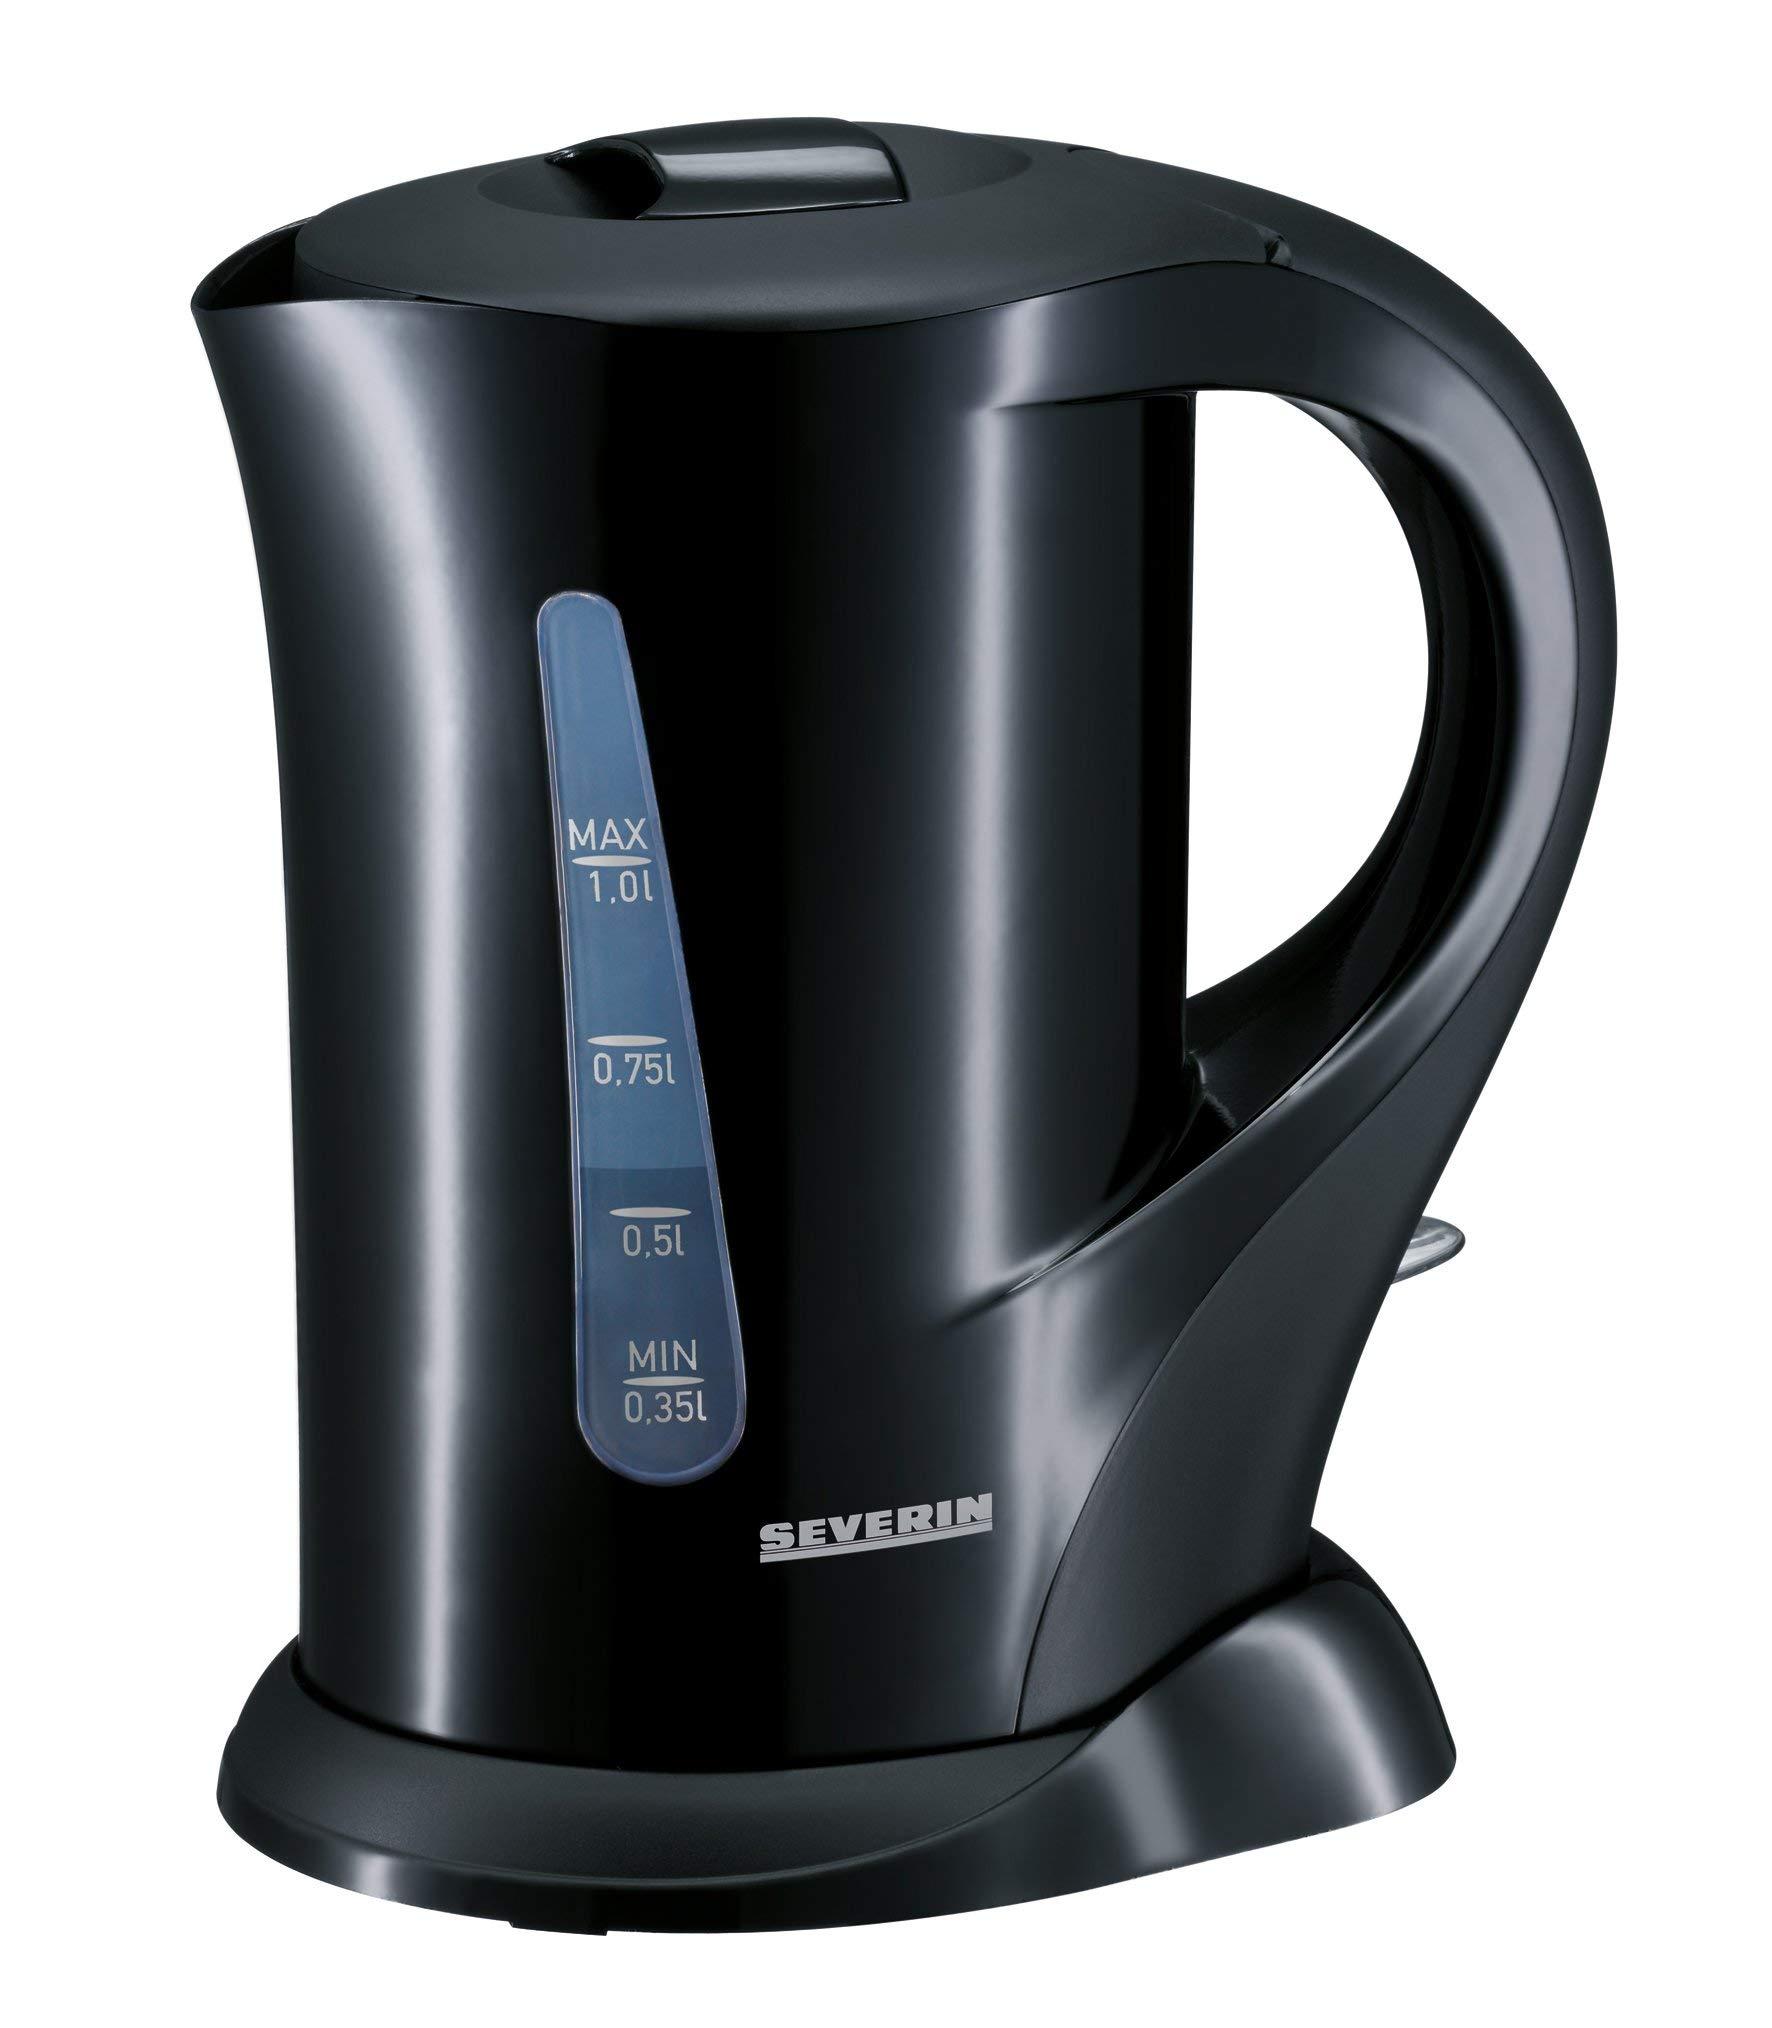 Severin-Wasserkocher-Kunststoff-1-Liter